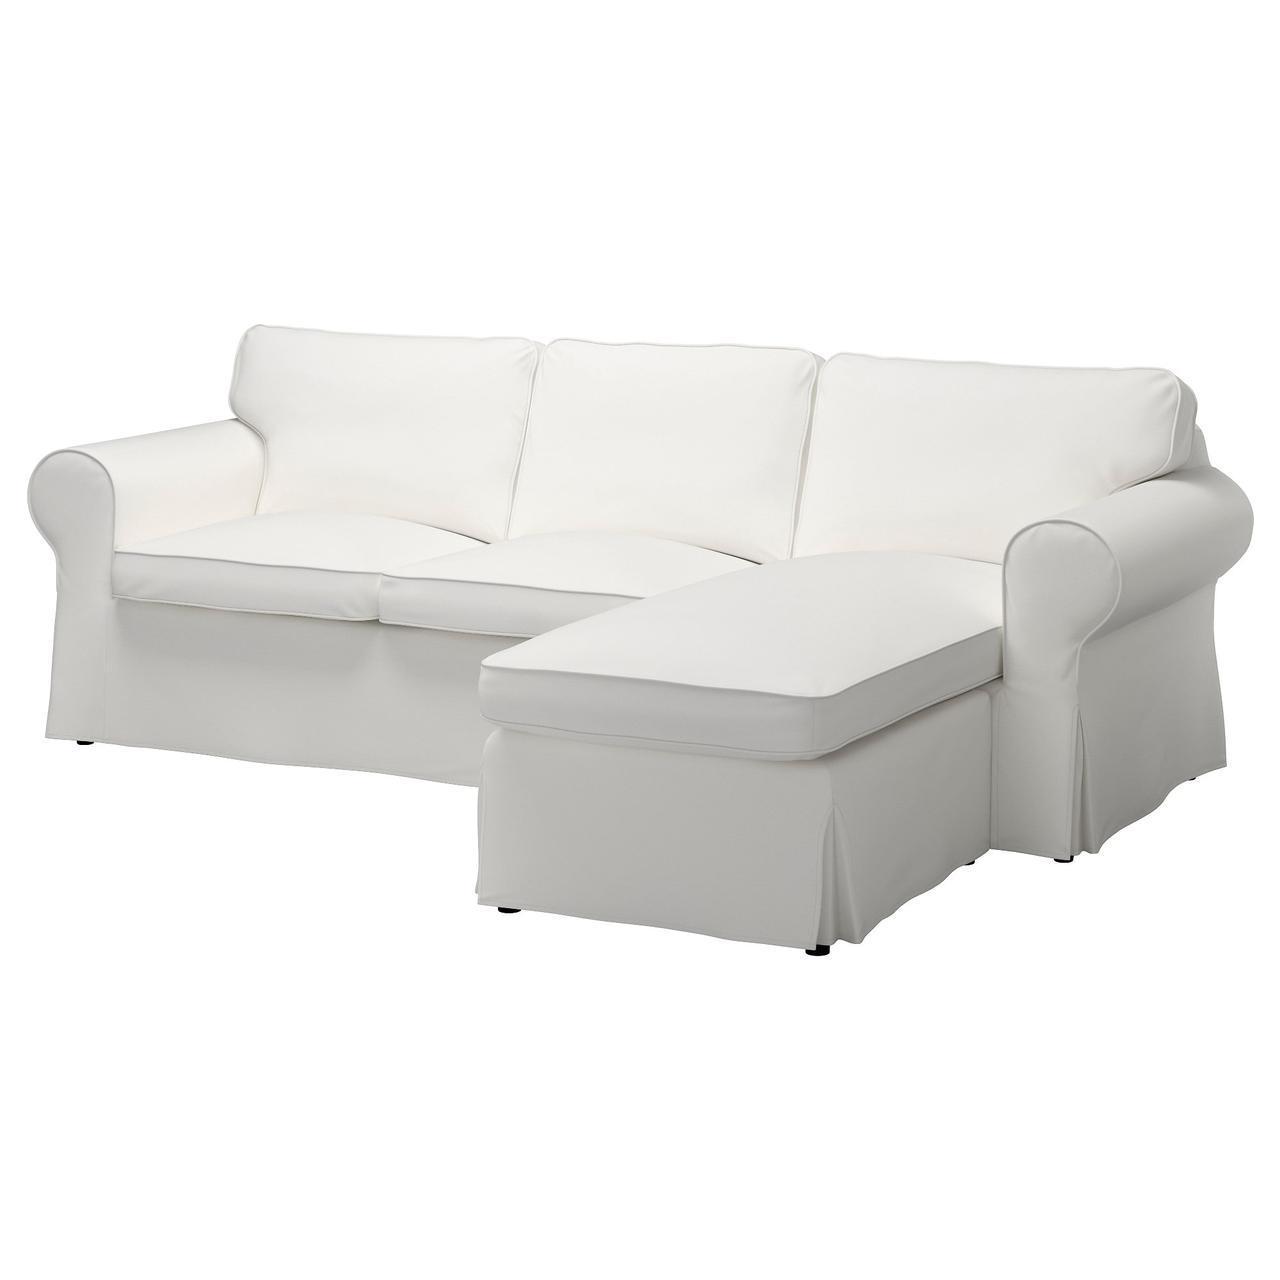 IKEA EKTORP (391.291.58) 3-местный диван, Lofallet с шезлонгом, Lofallet